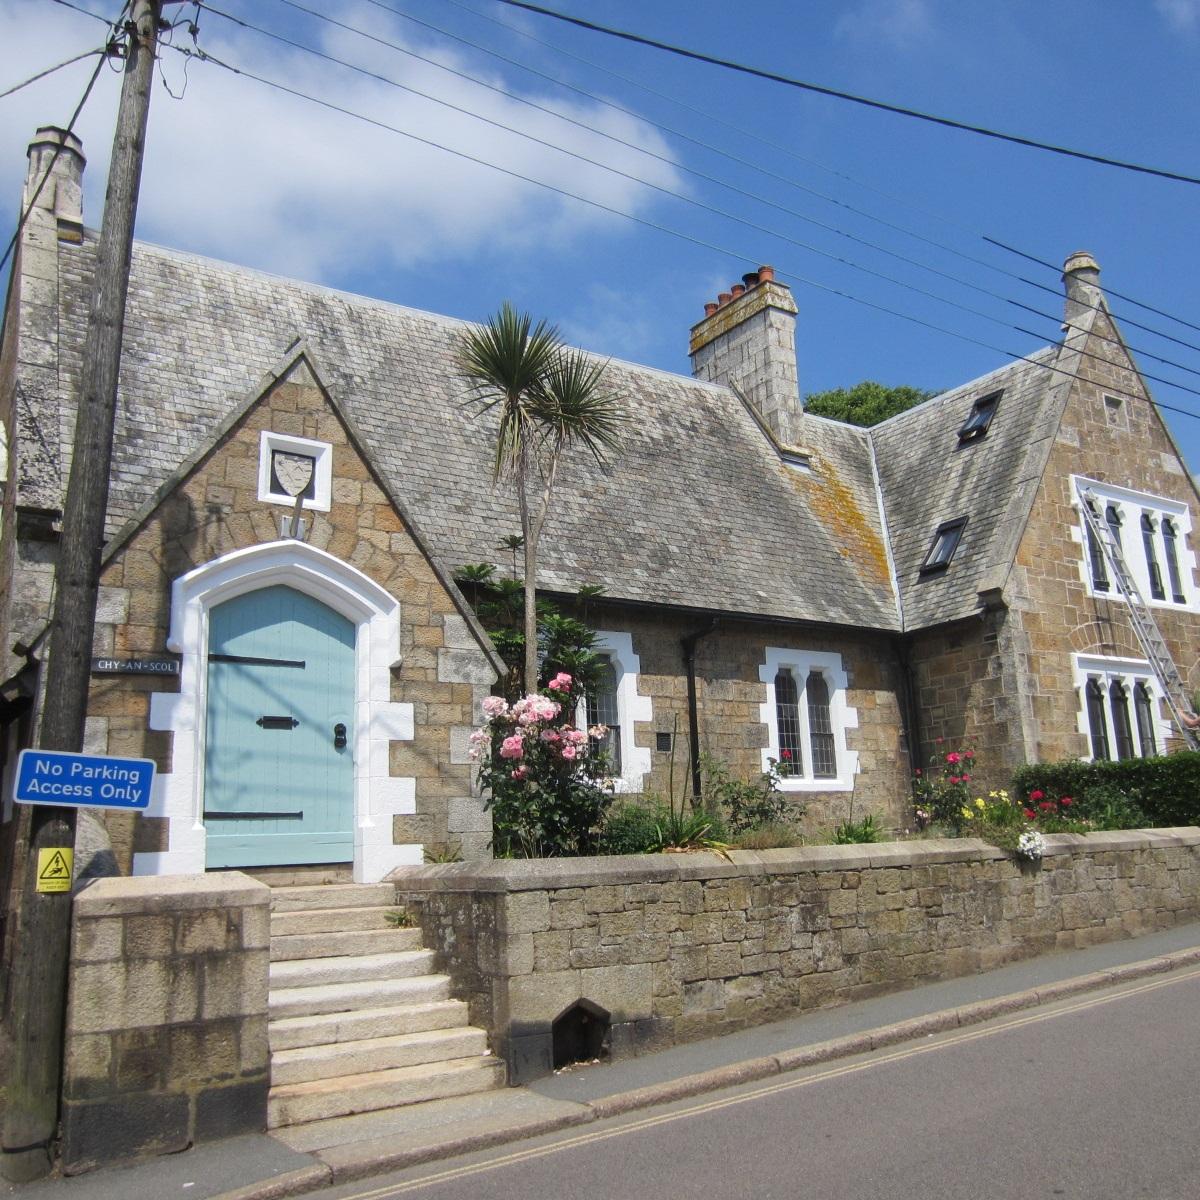 Chy-an-Scol - Turnpike Hill, Marazion, Cornwall, TR17 0BZ01736 710687